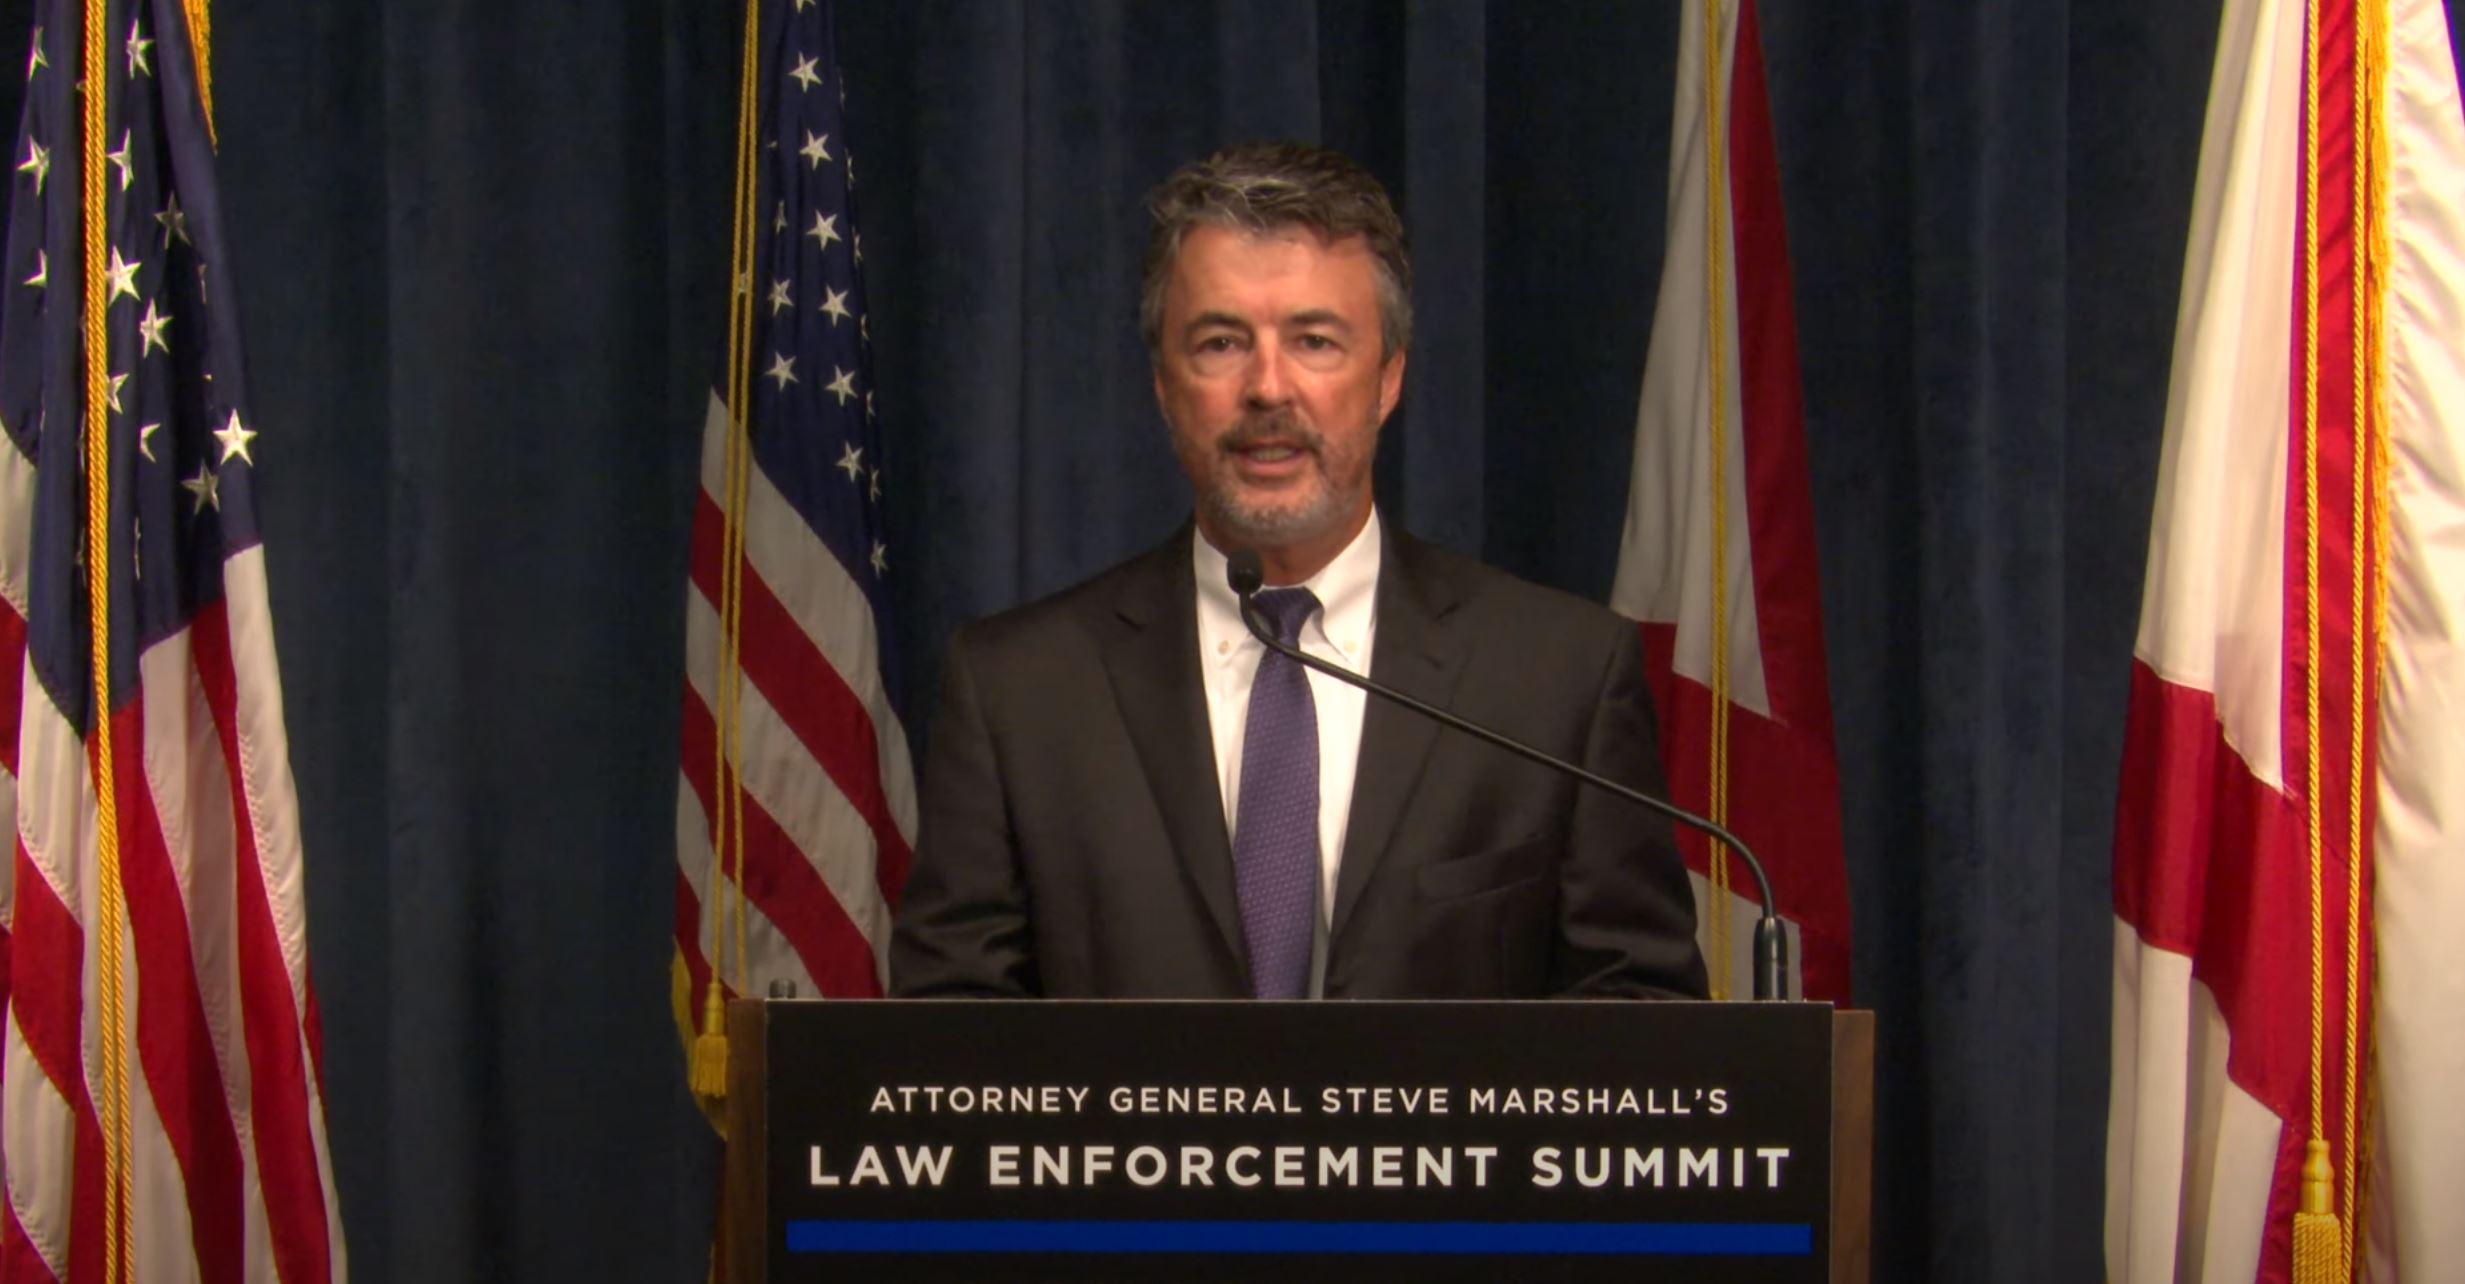 Marshall seeks second term as Alabama attorney general